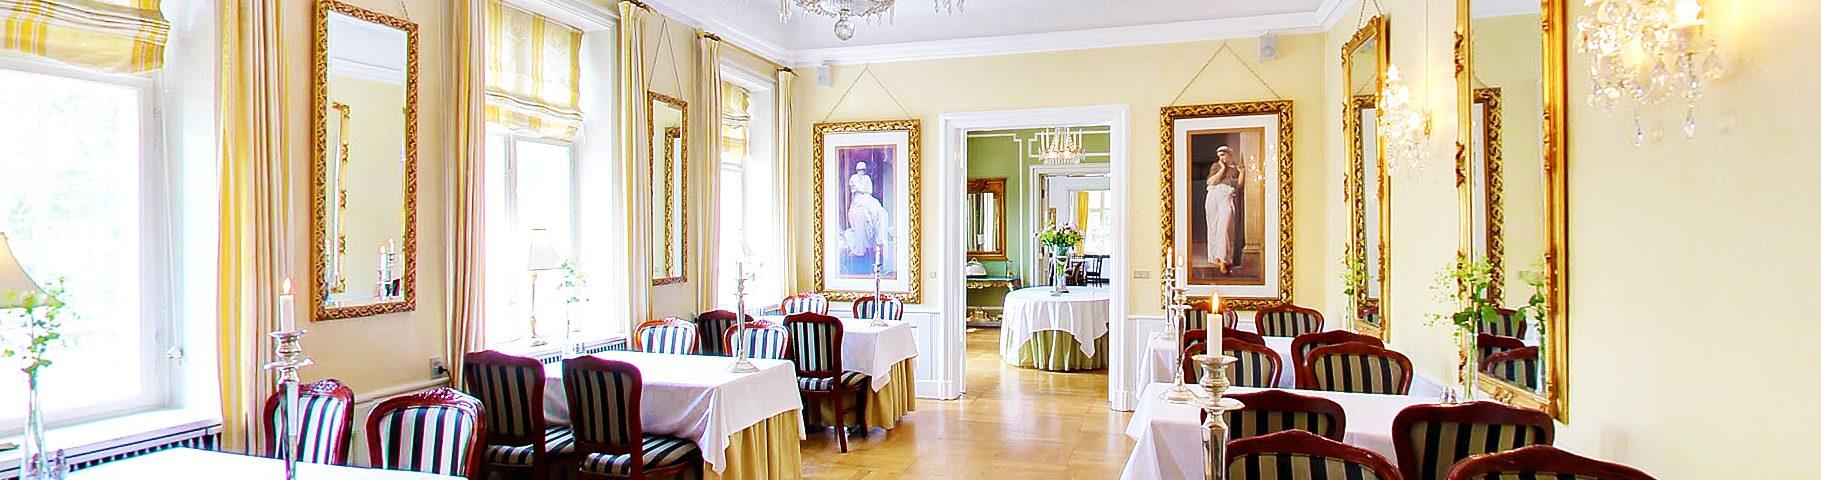 small restaurant1